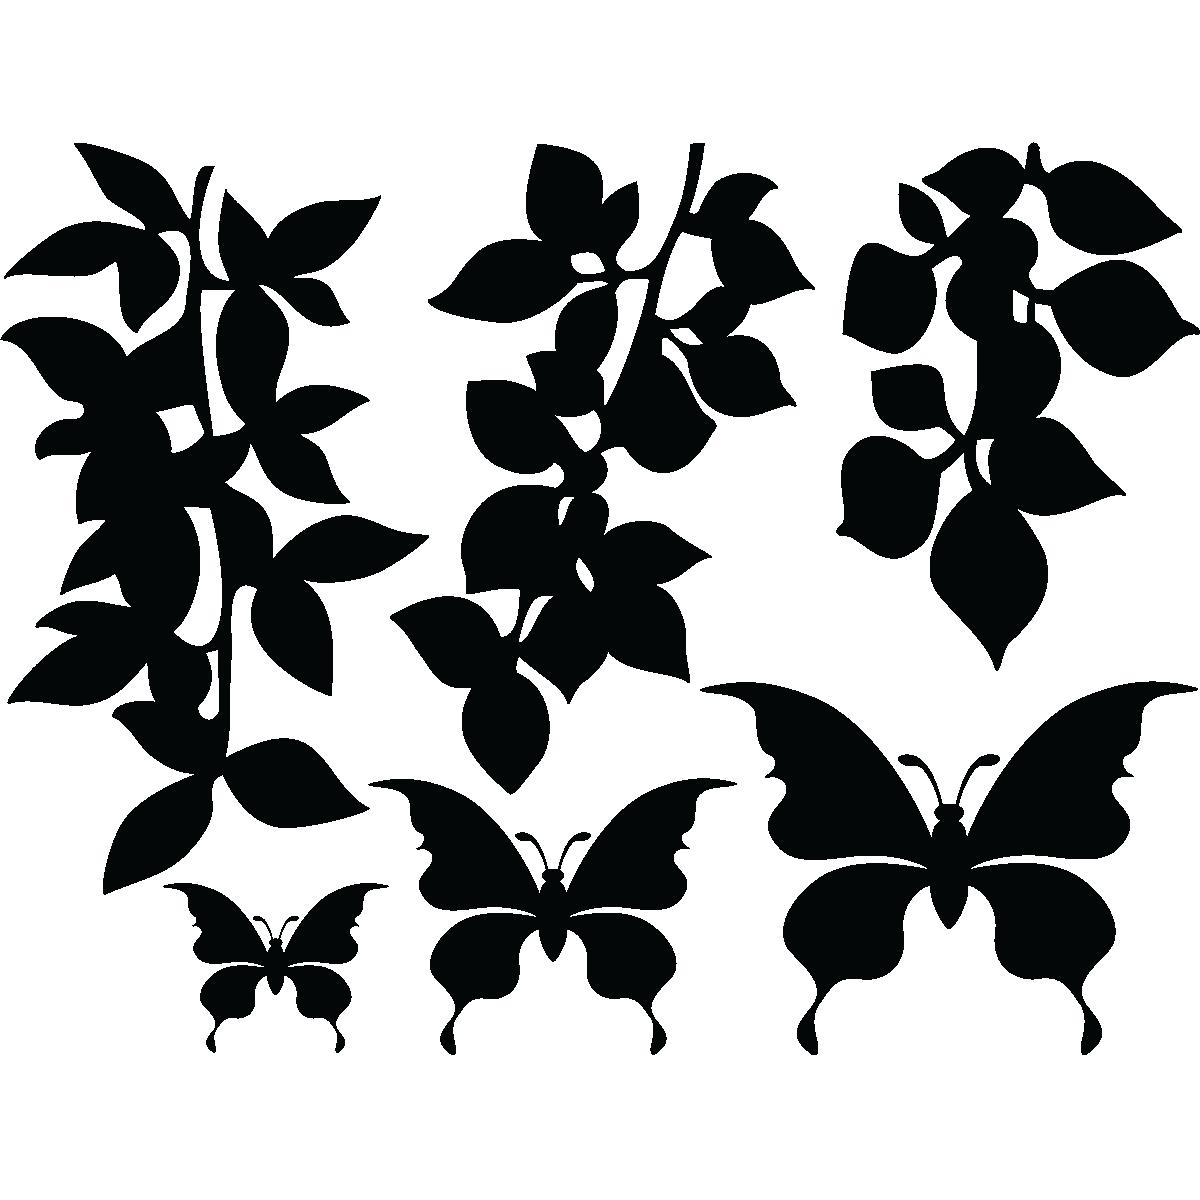 Muurstickers dieren muursticker vlinders en takken ambiance - Deco kamer stijl engels ...